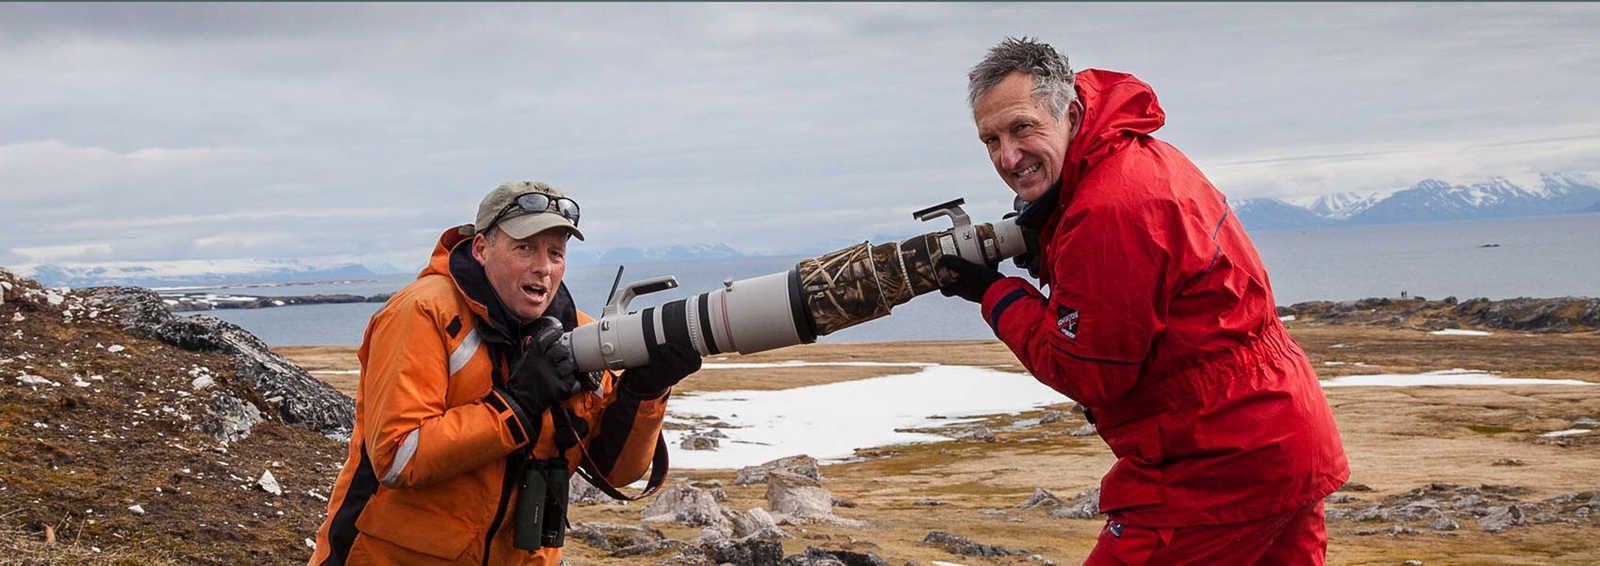 Mark Carwardine and Paul Goldstein present Pole to Pole